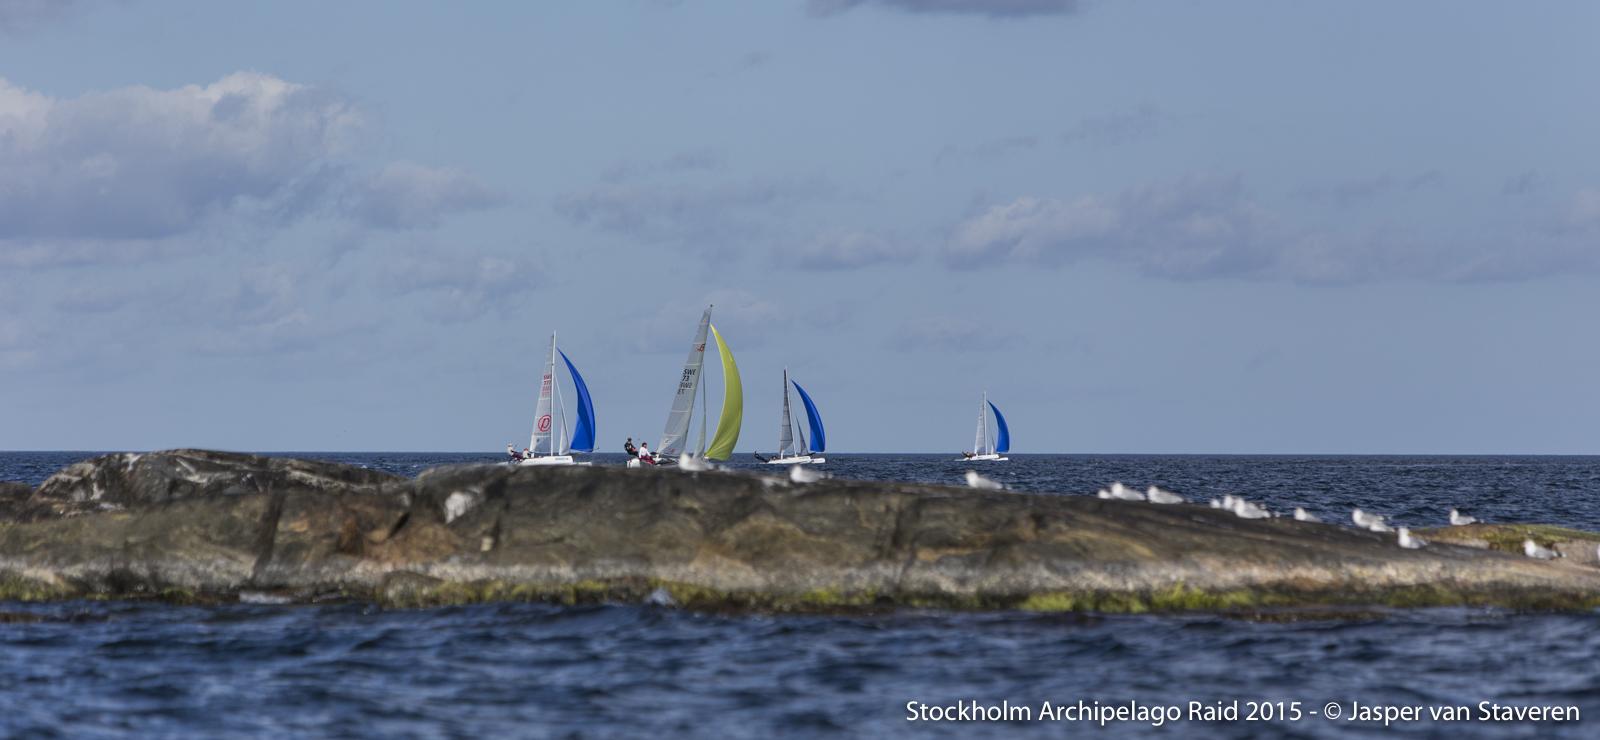 Stockholm Archipelago Raid 2015-5422